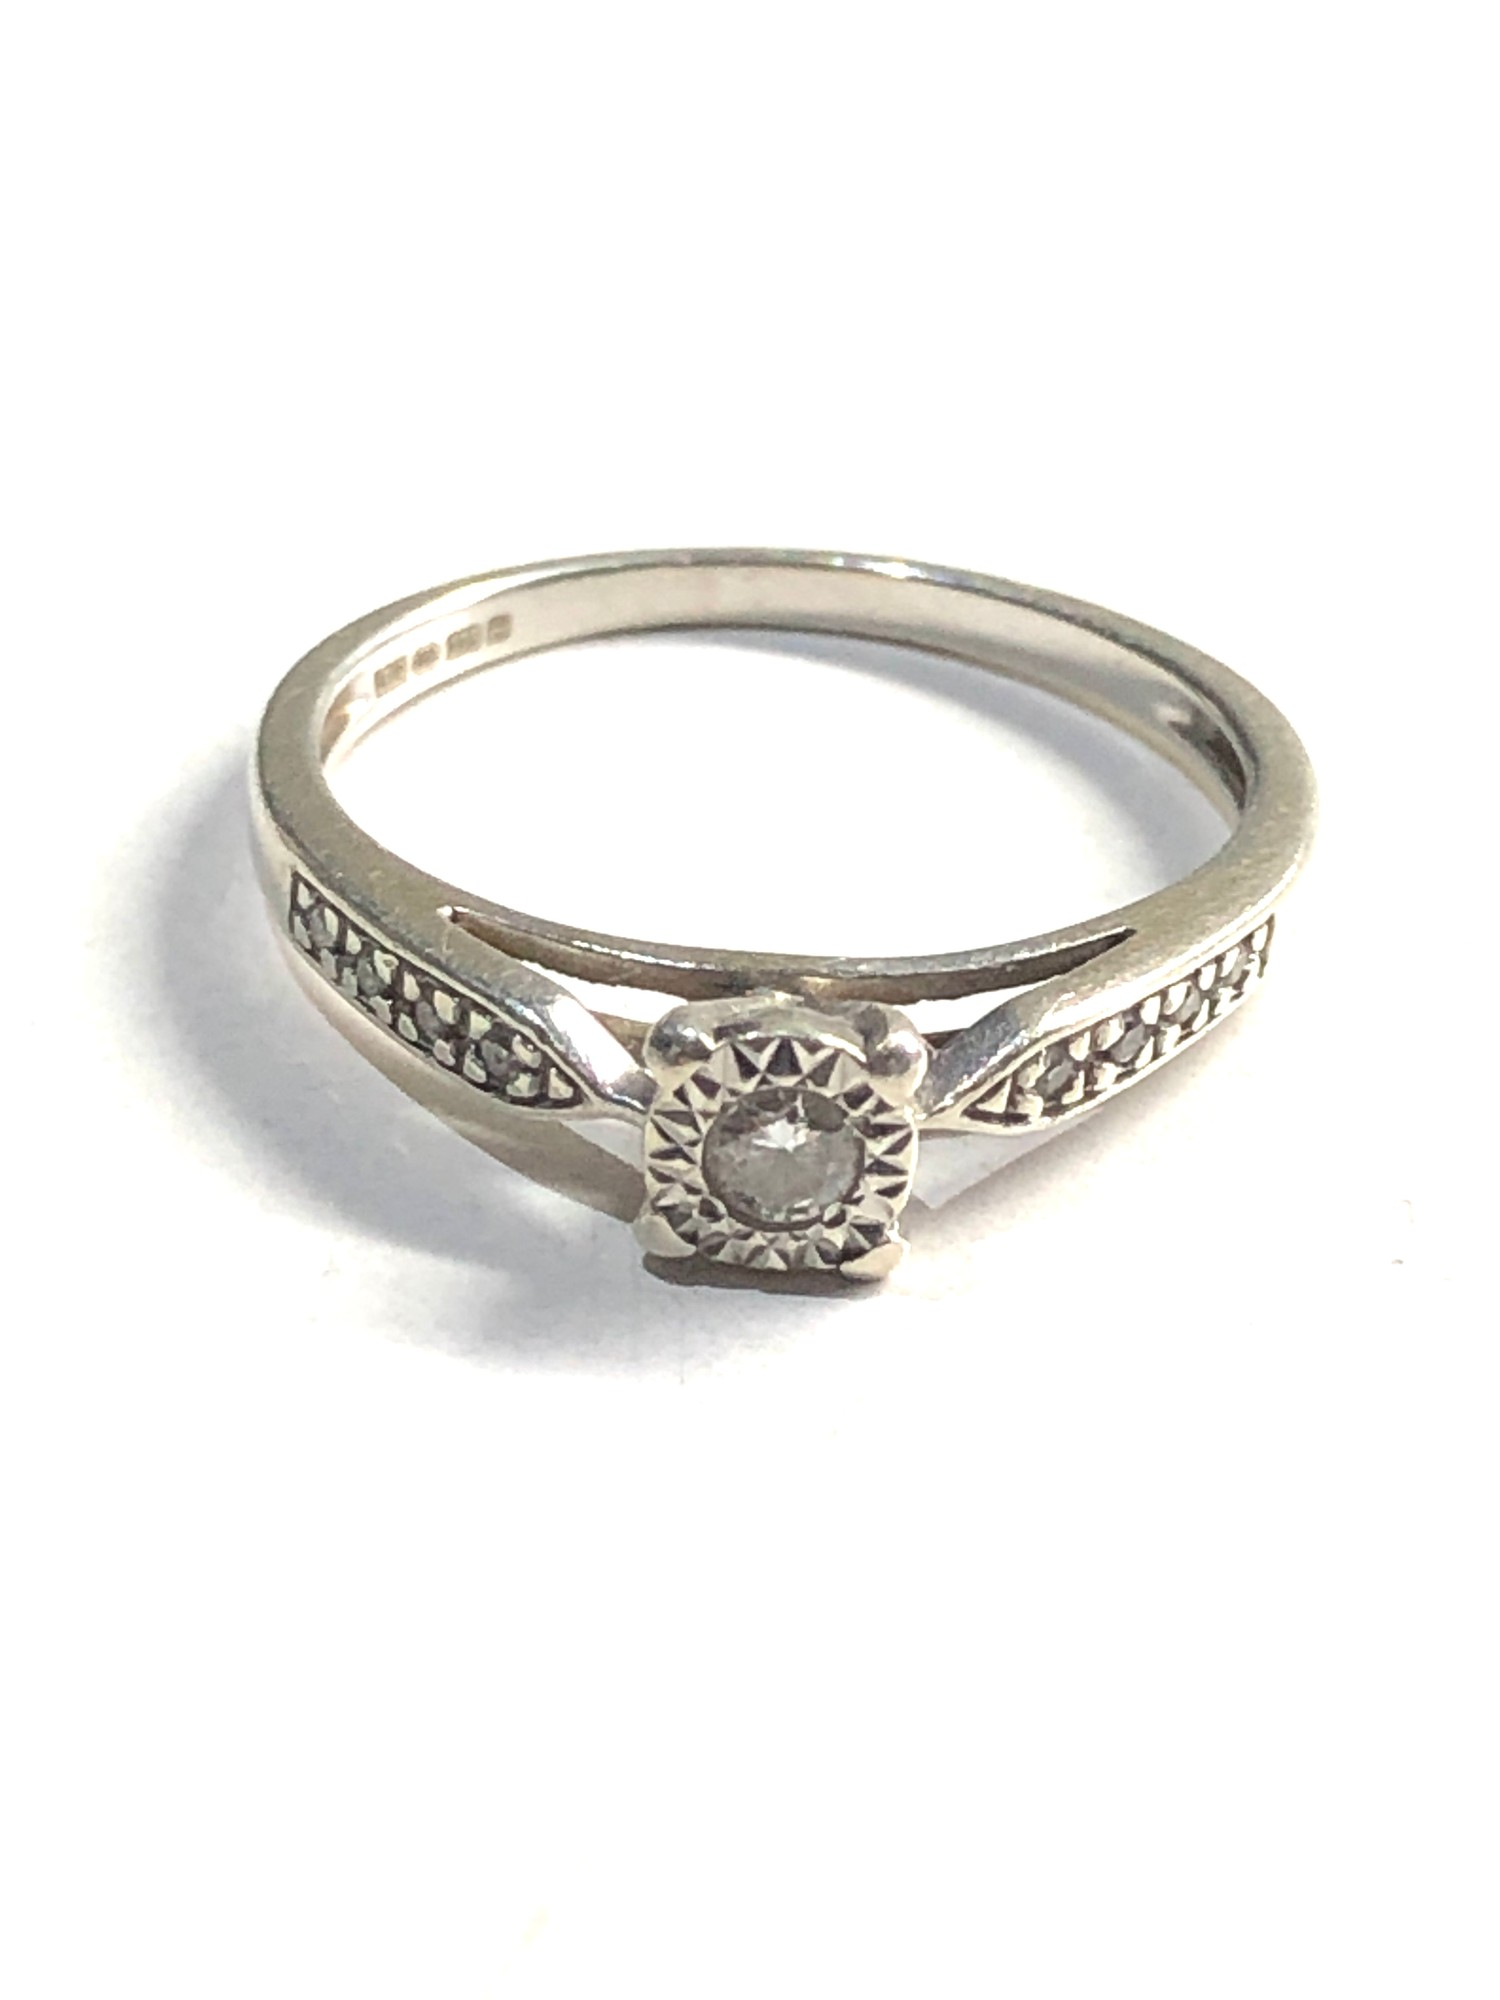 9ct White gold diamond ring 1.8g - Image 2 of 3